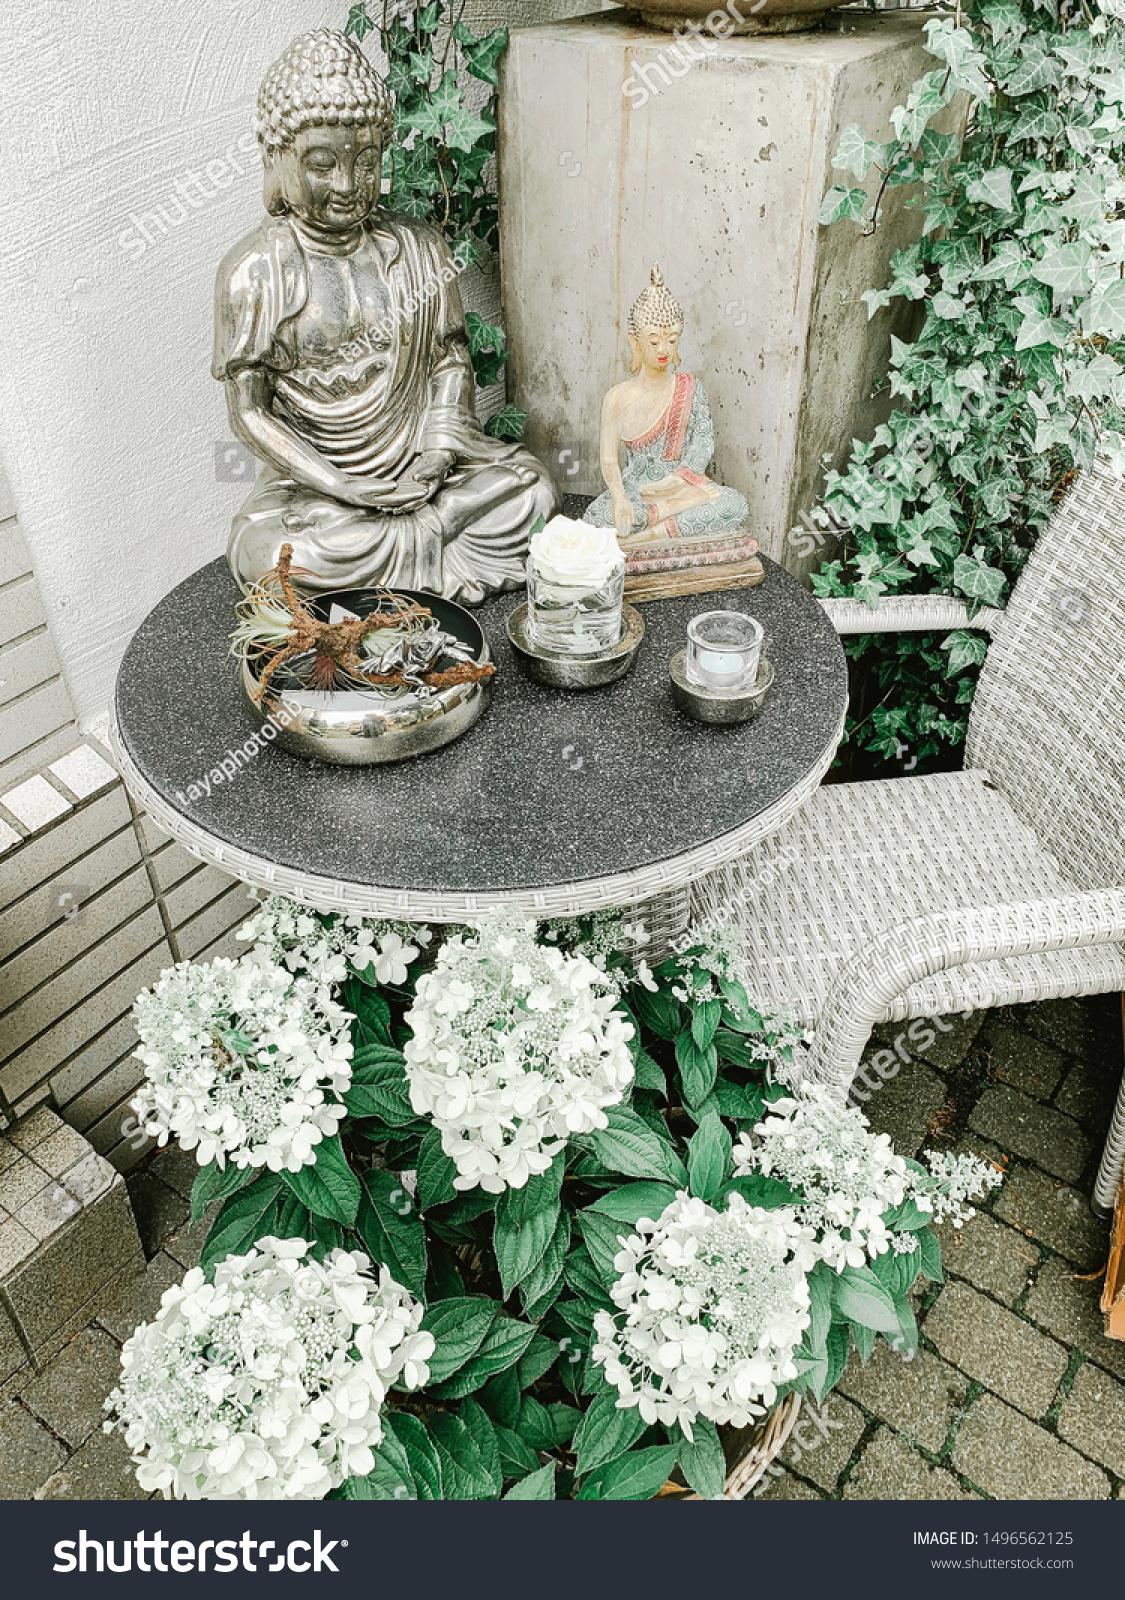 Beautiful Design Elements Deco Items Home Stock Photo Edit Now 1496562125